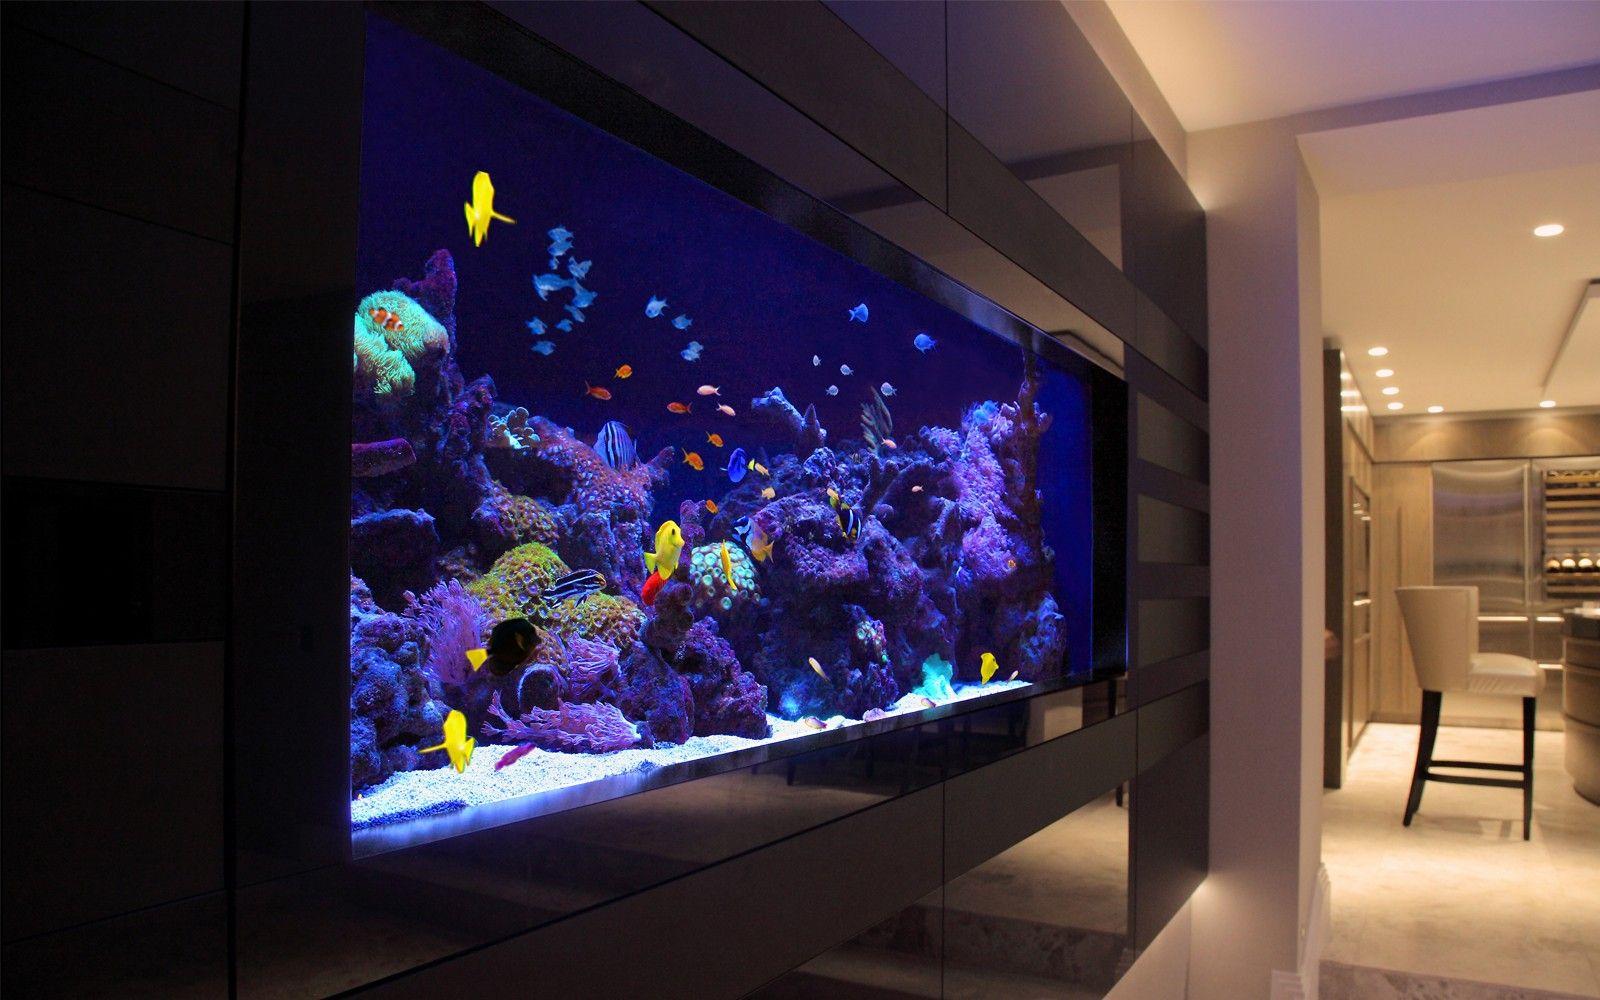 Fish aquarium buy online - Fish Aquarium Buy Online